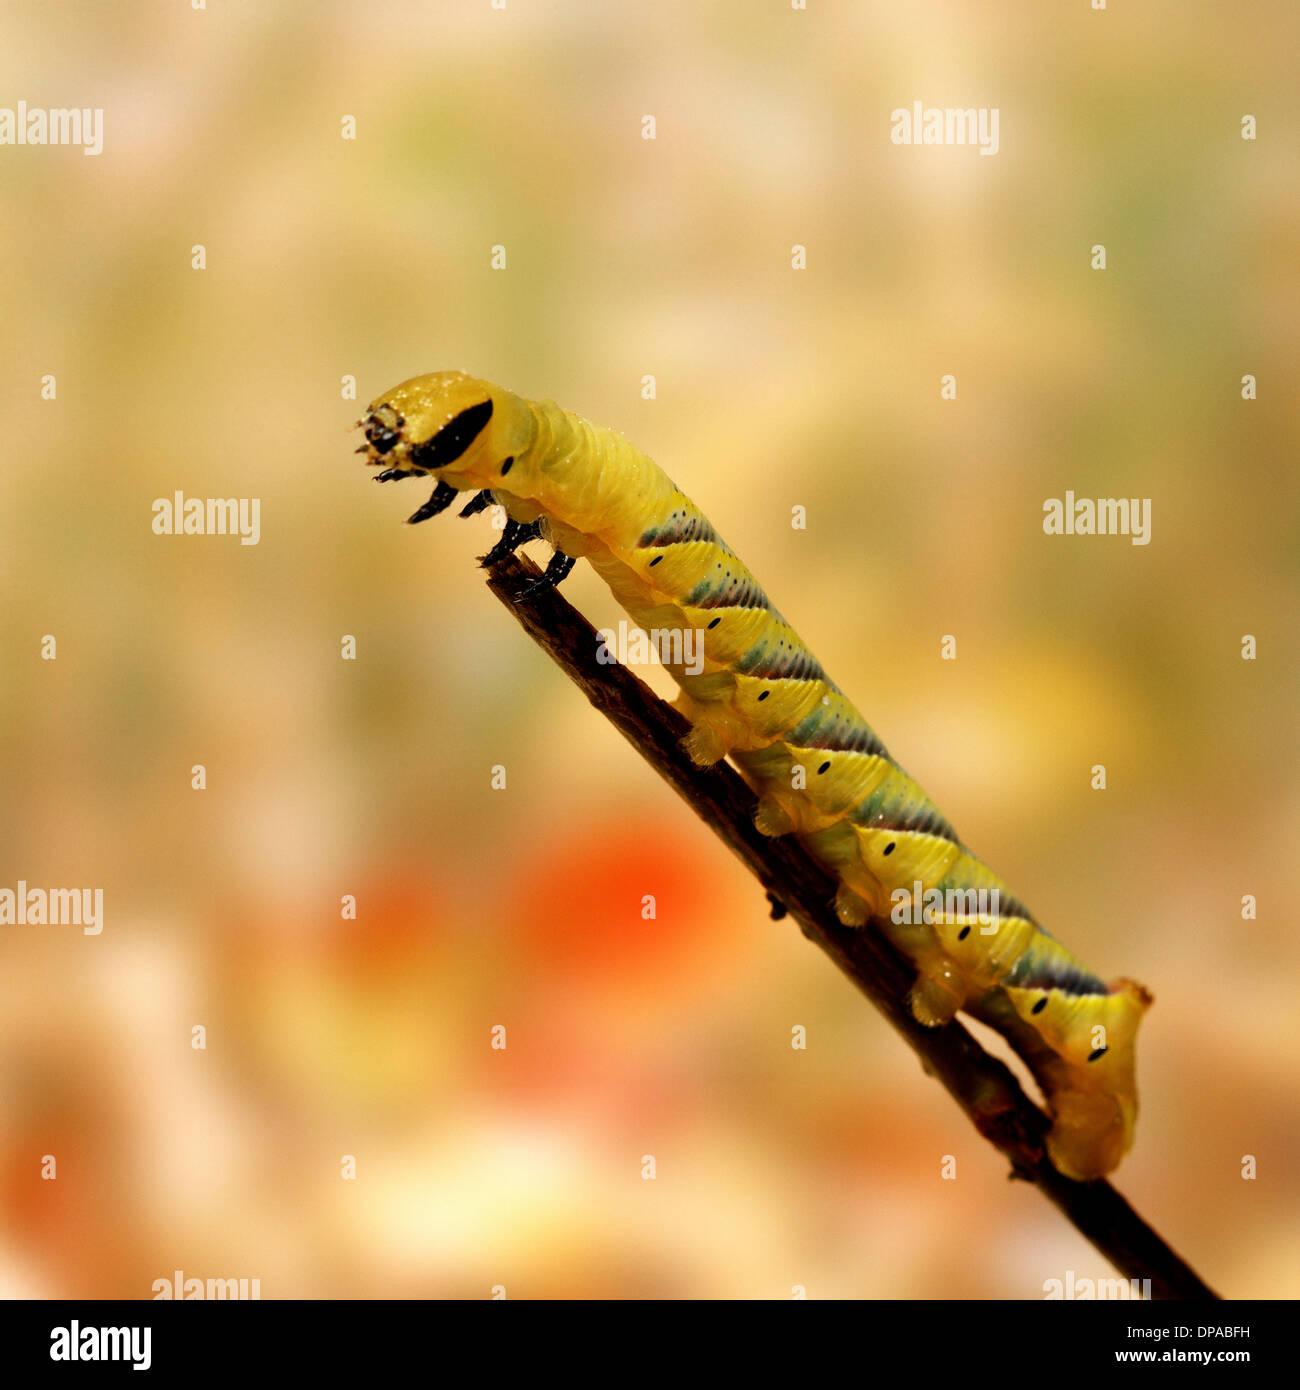 Caterpillar on twig - Stock Image